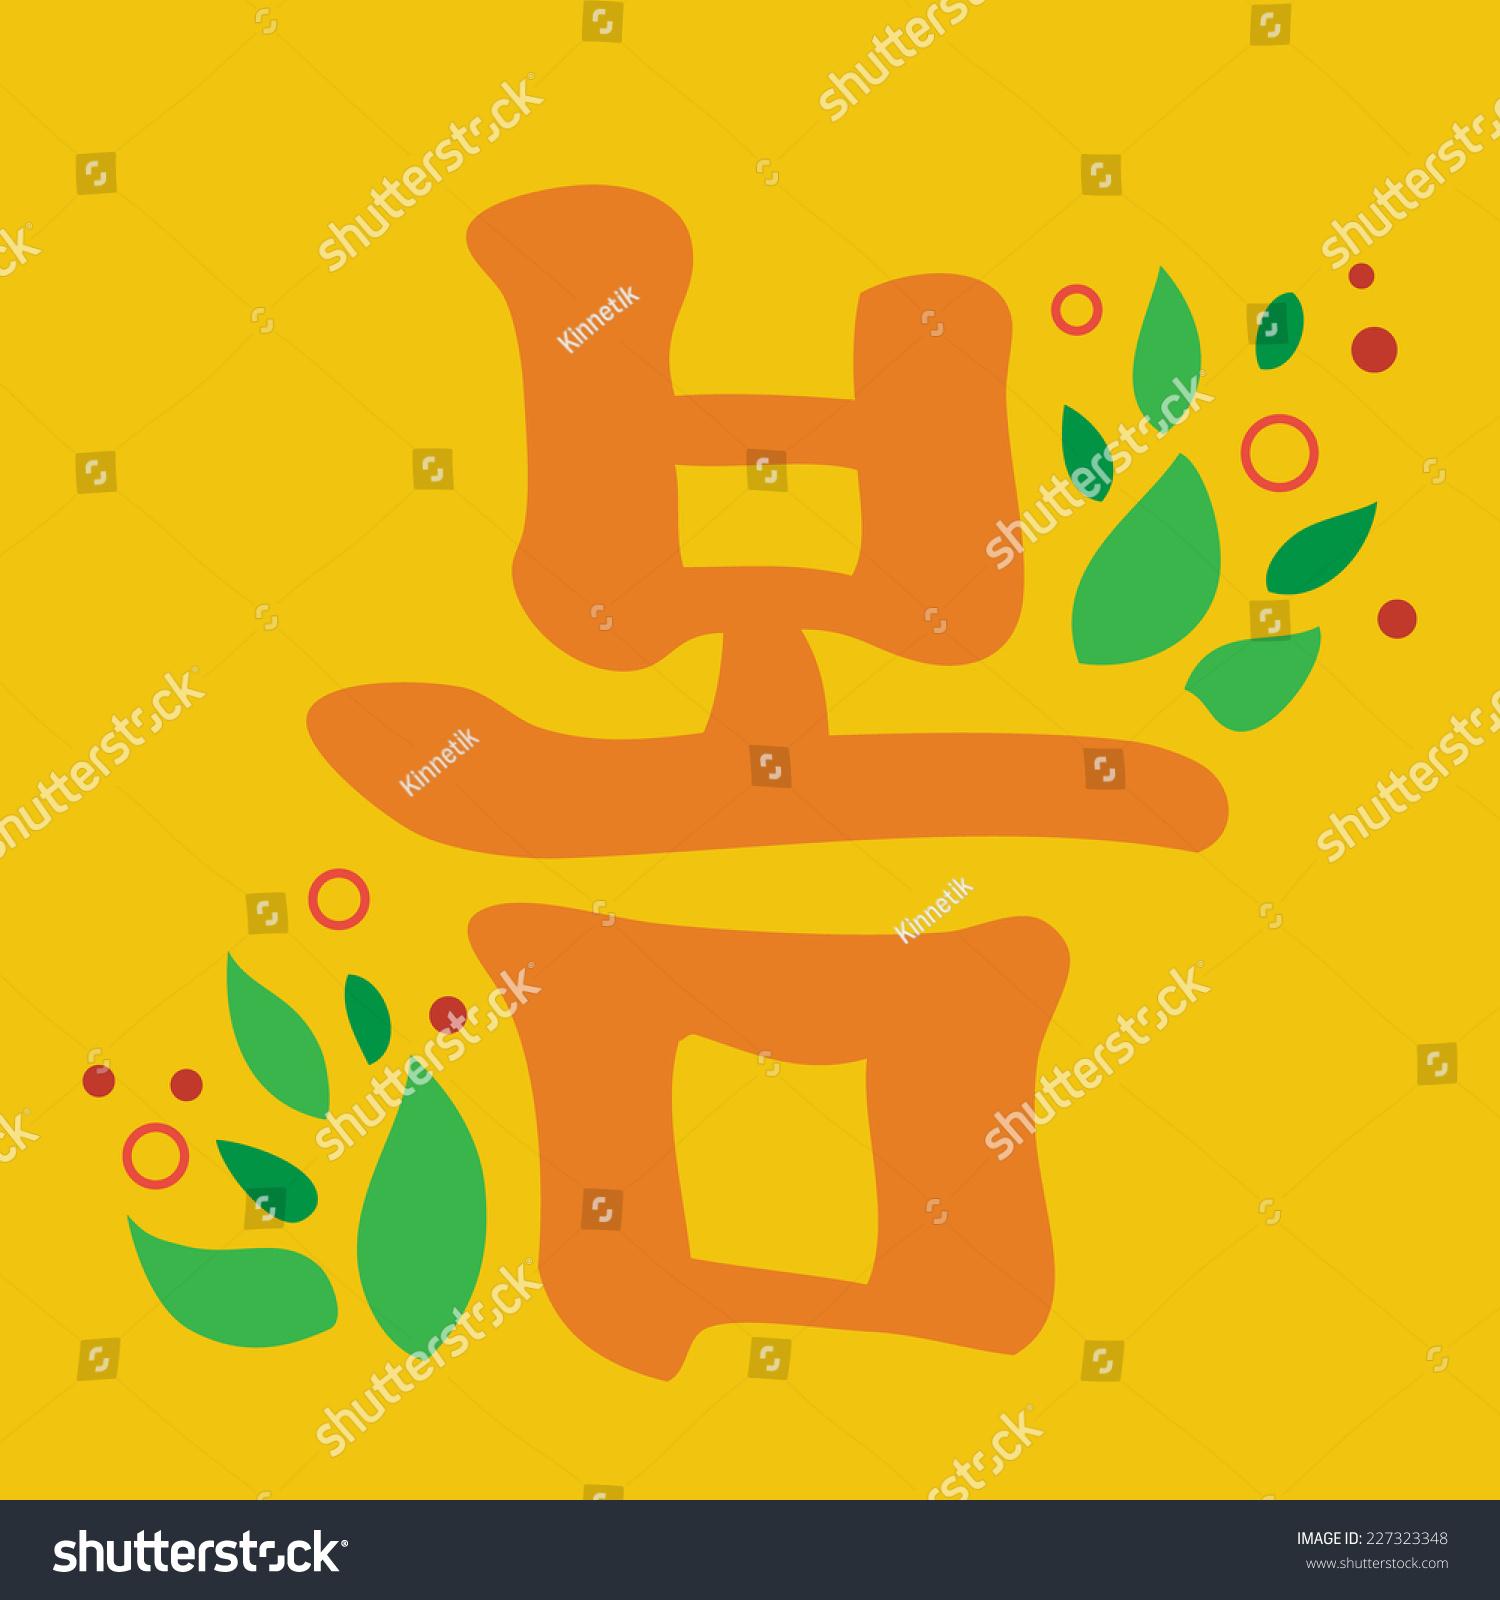 Korean word springvector illustration flat style stock vector korean word springctor illustration in flat style buycottarizona